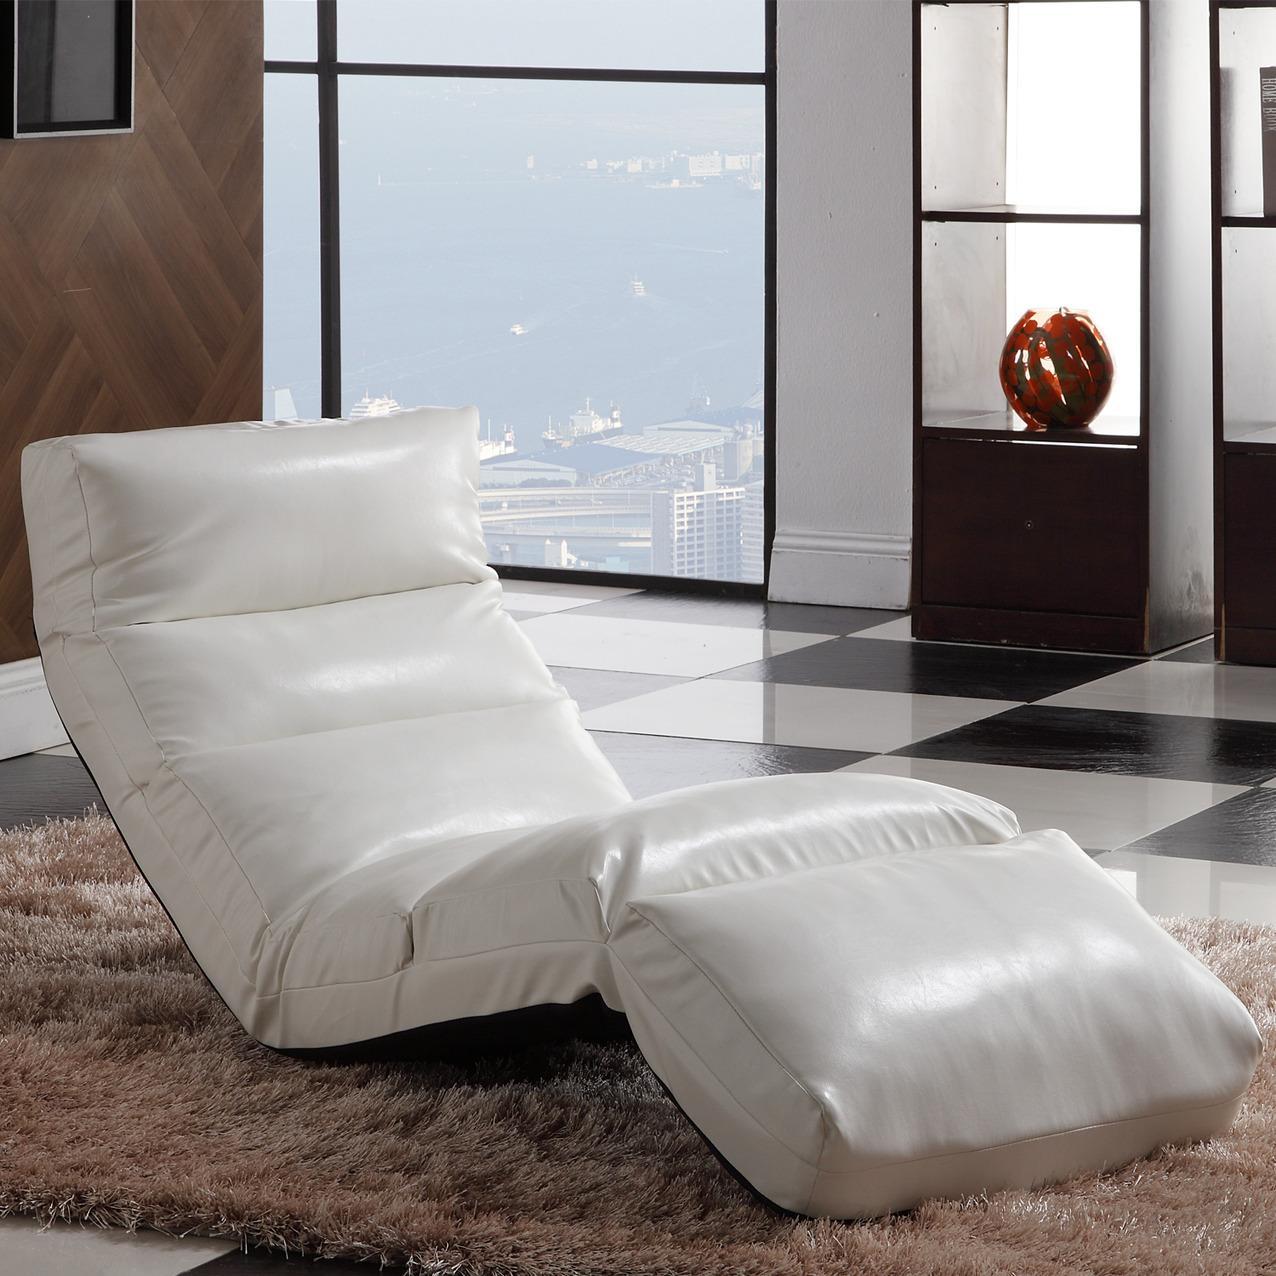 Naomi White Memory Foam Floor Lounge Chair 13642279